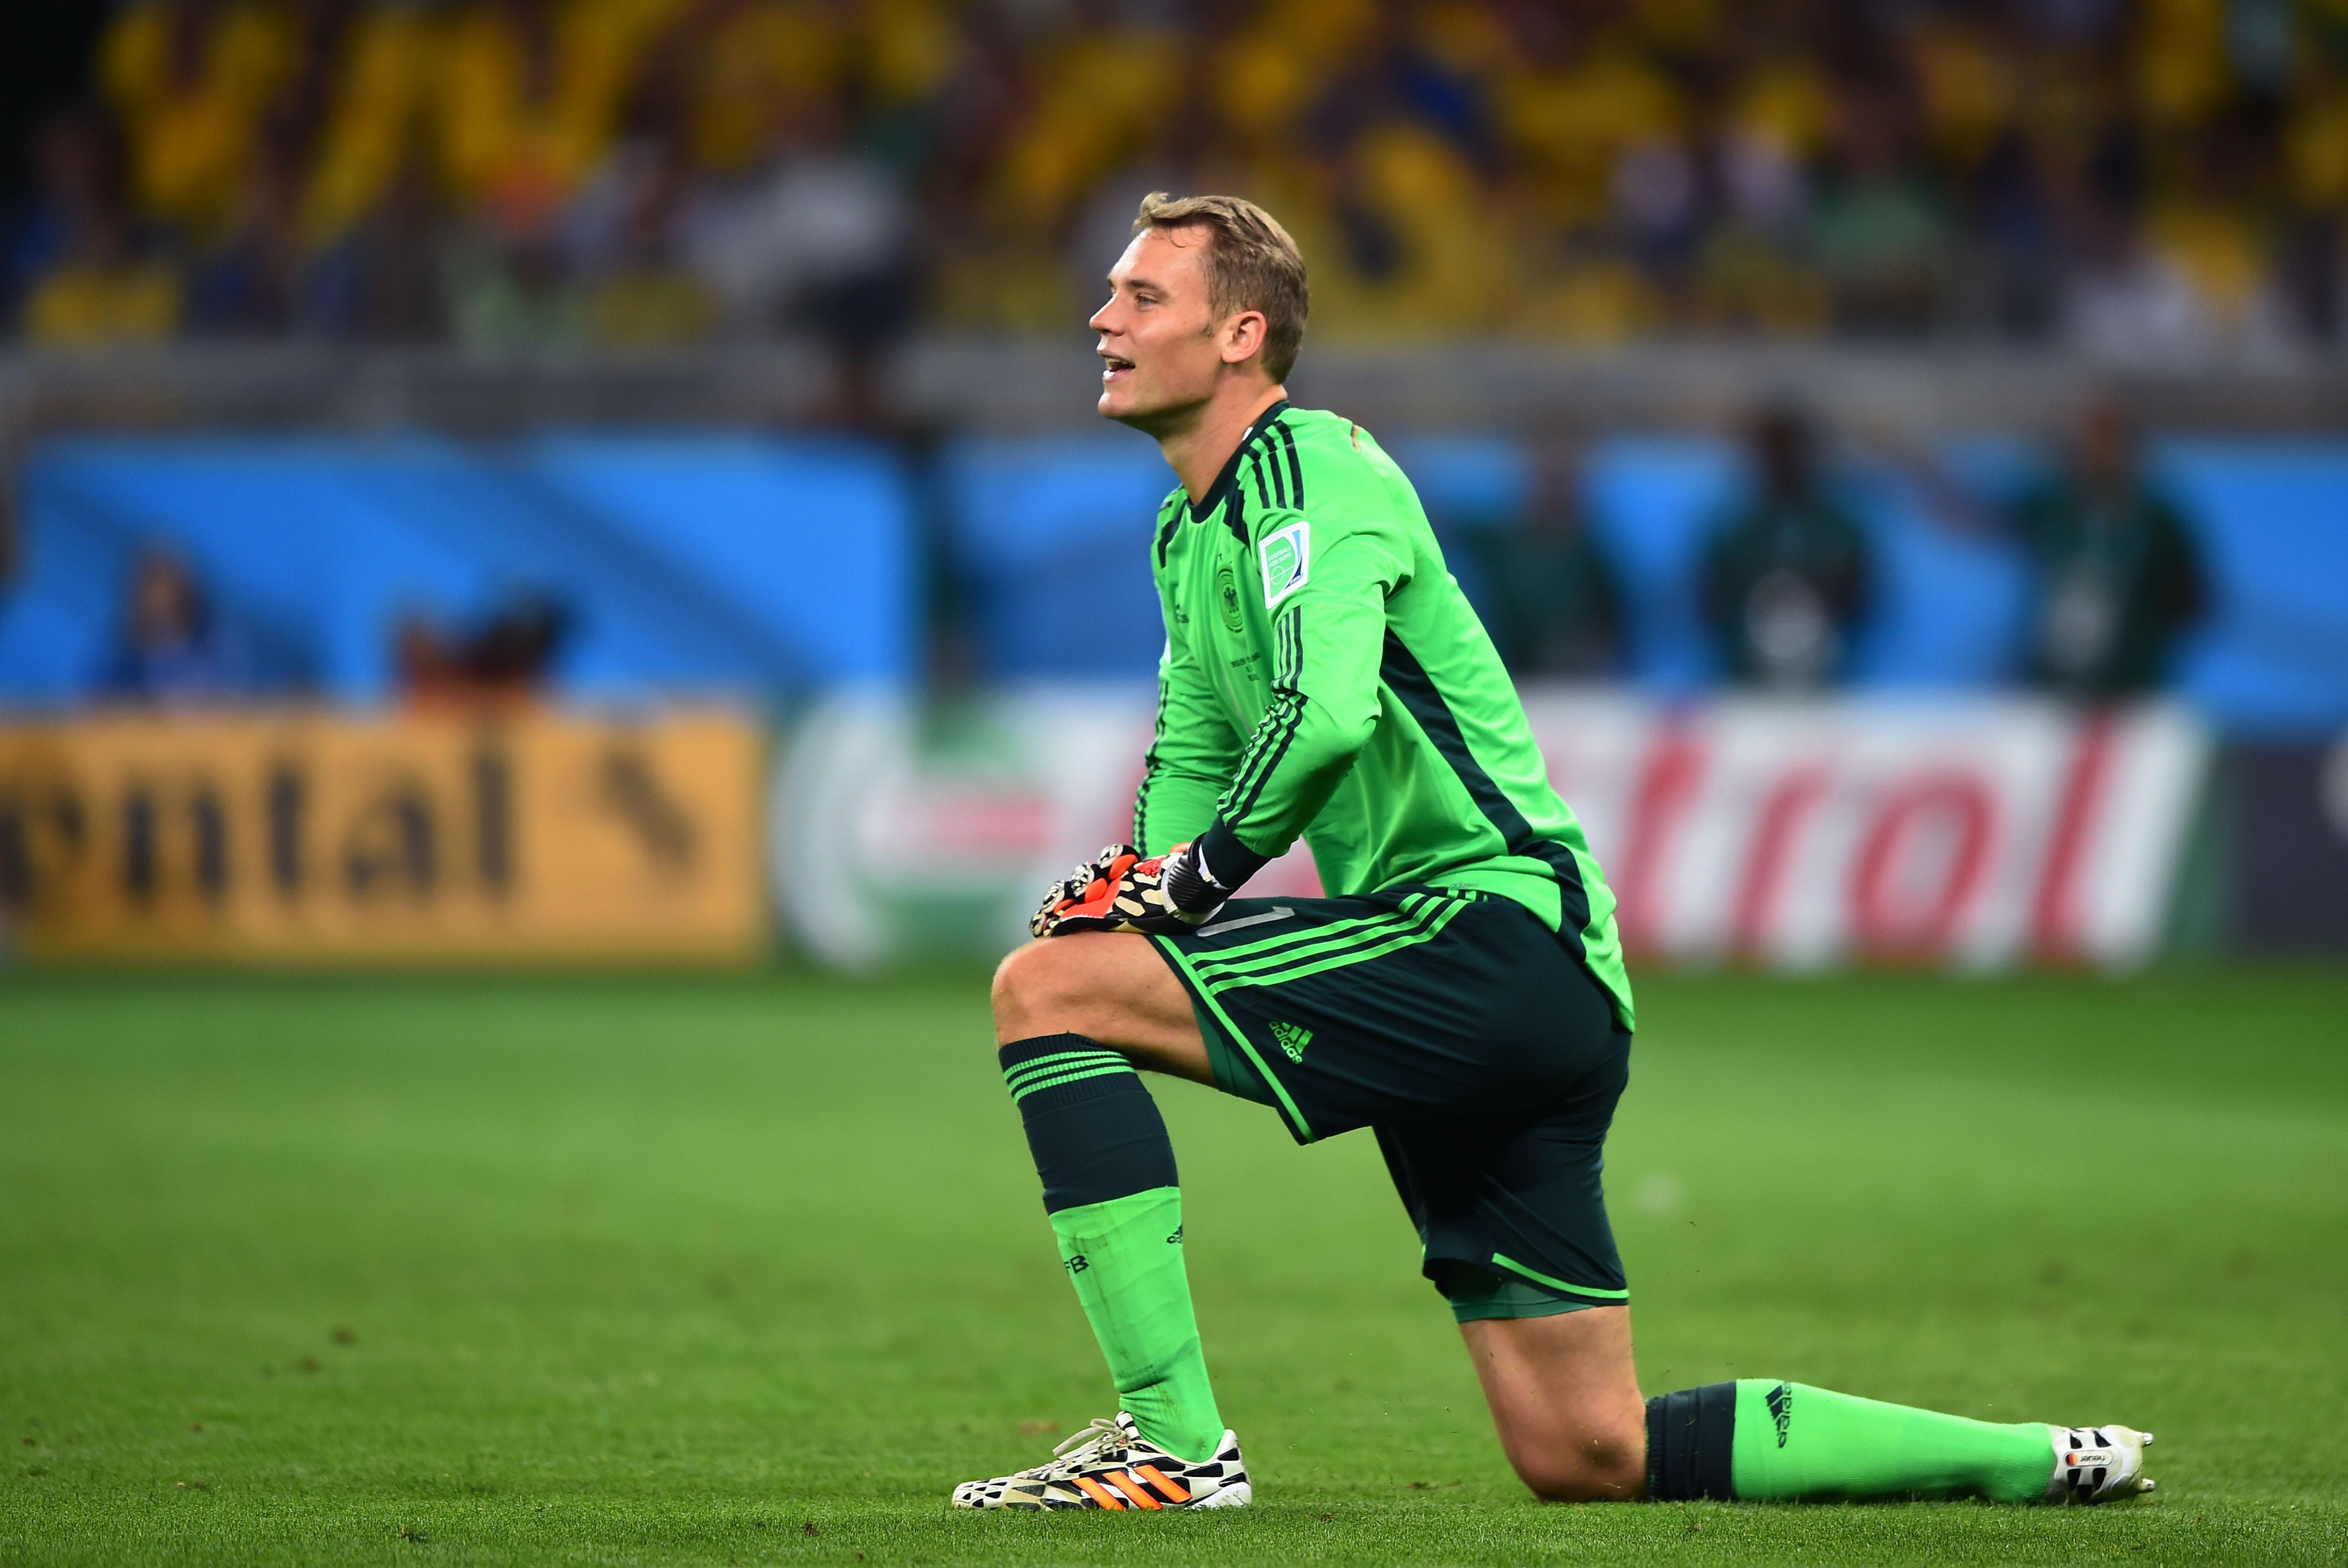 Manuel Neuer Wins Golden Glove at 2014 World Cup ...  Manuel Neuer Wi...